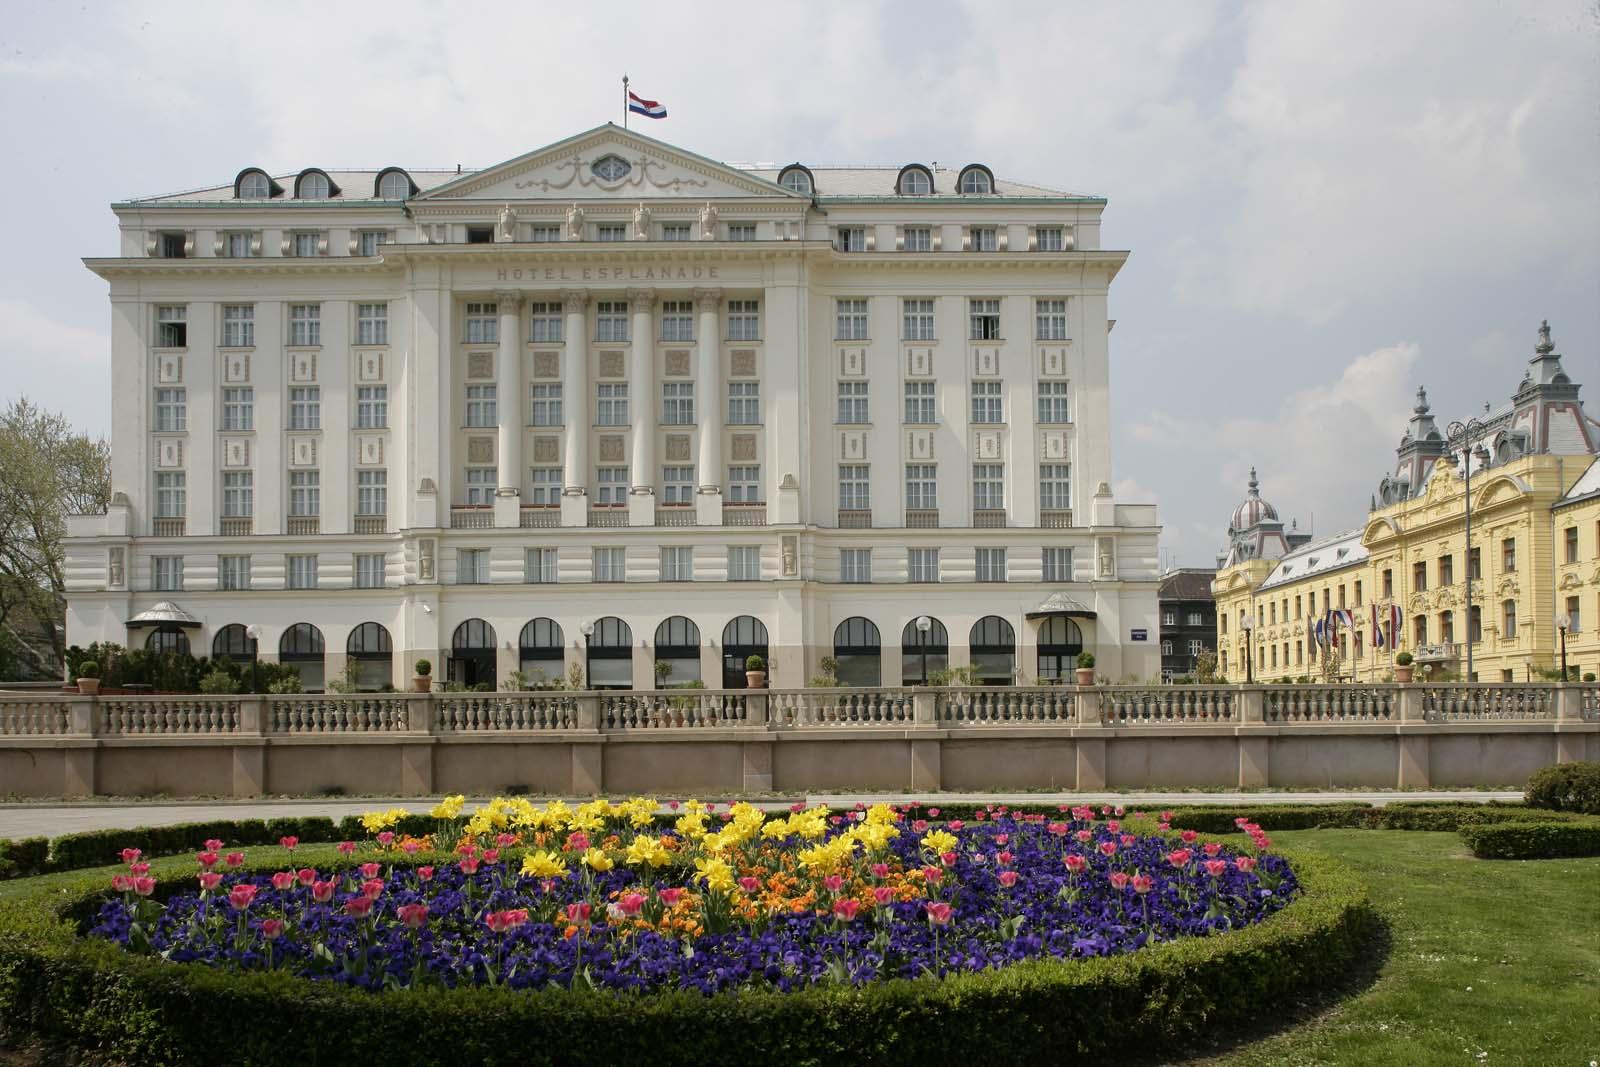 Lovezagreb Hr Hotel Esplanade And The Legendary Orient Express